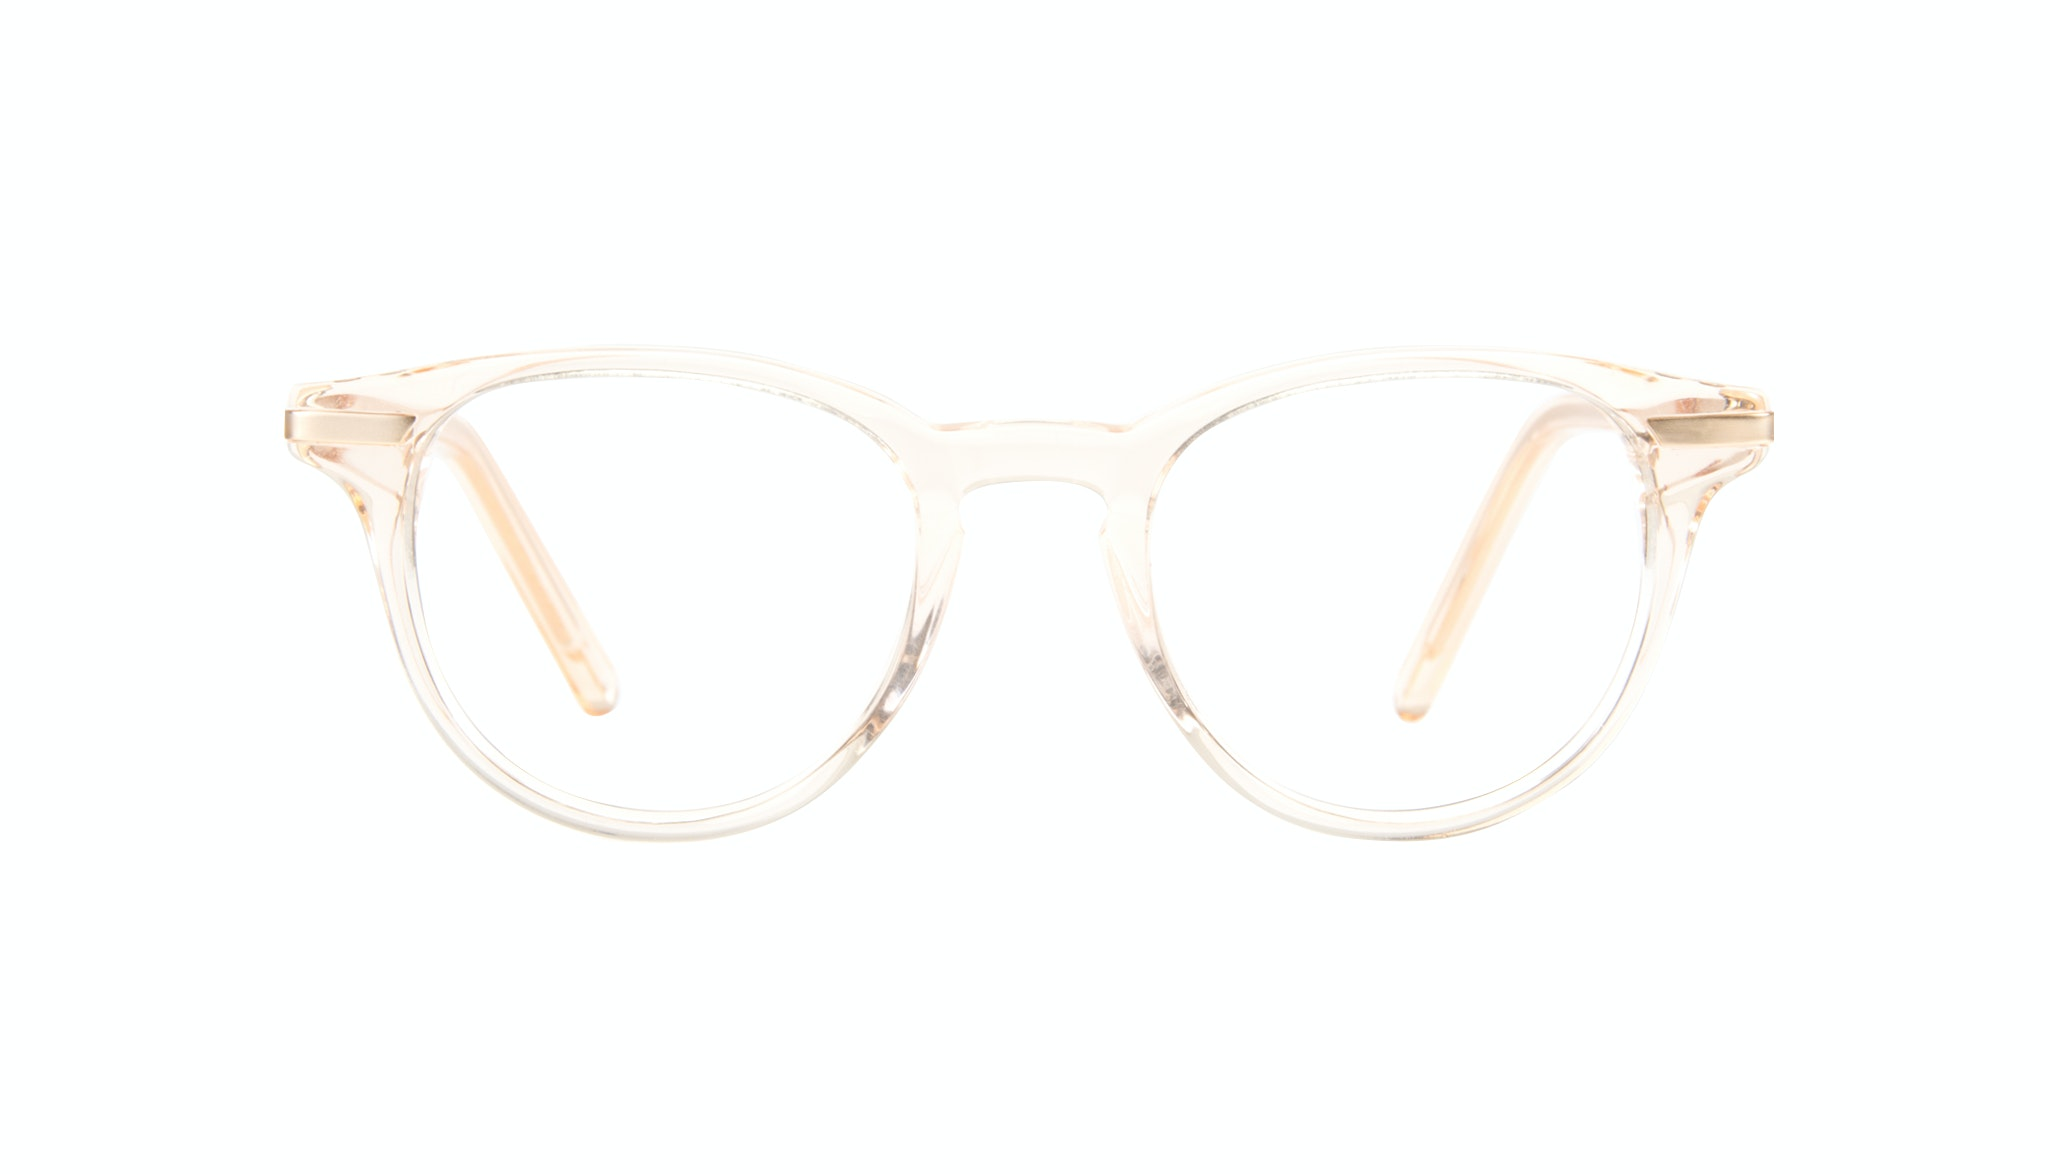 Affordable Fashion Glasses Round Eyeglasses Women Spark Blond